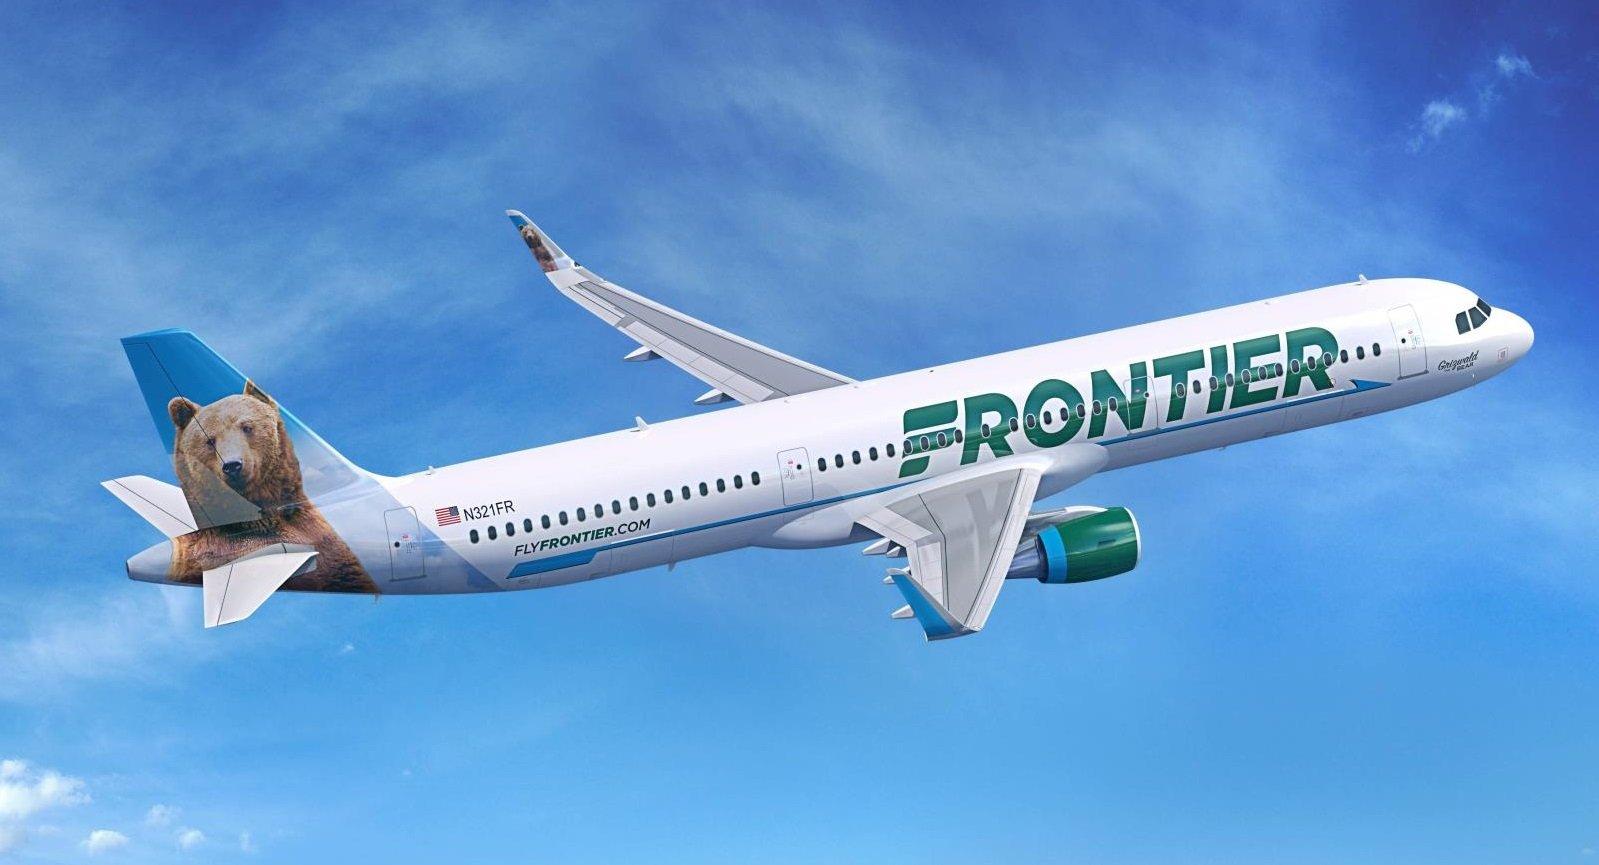 Third Airline to Add New Nonstop Flights to Myrtle Beach ...